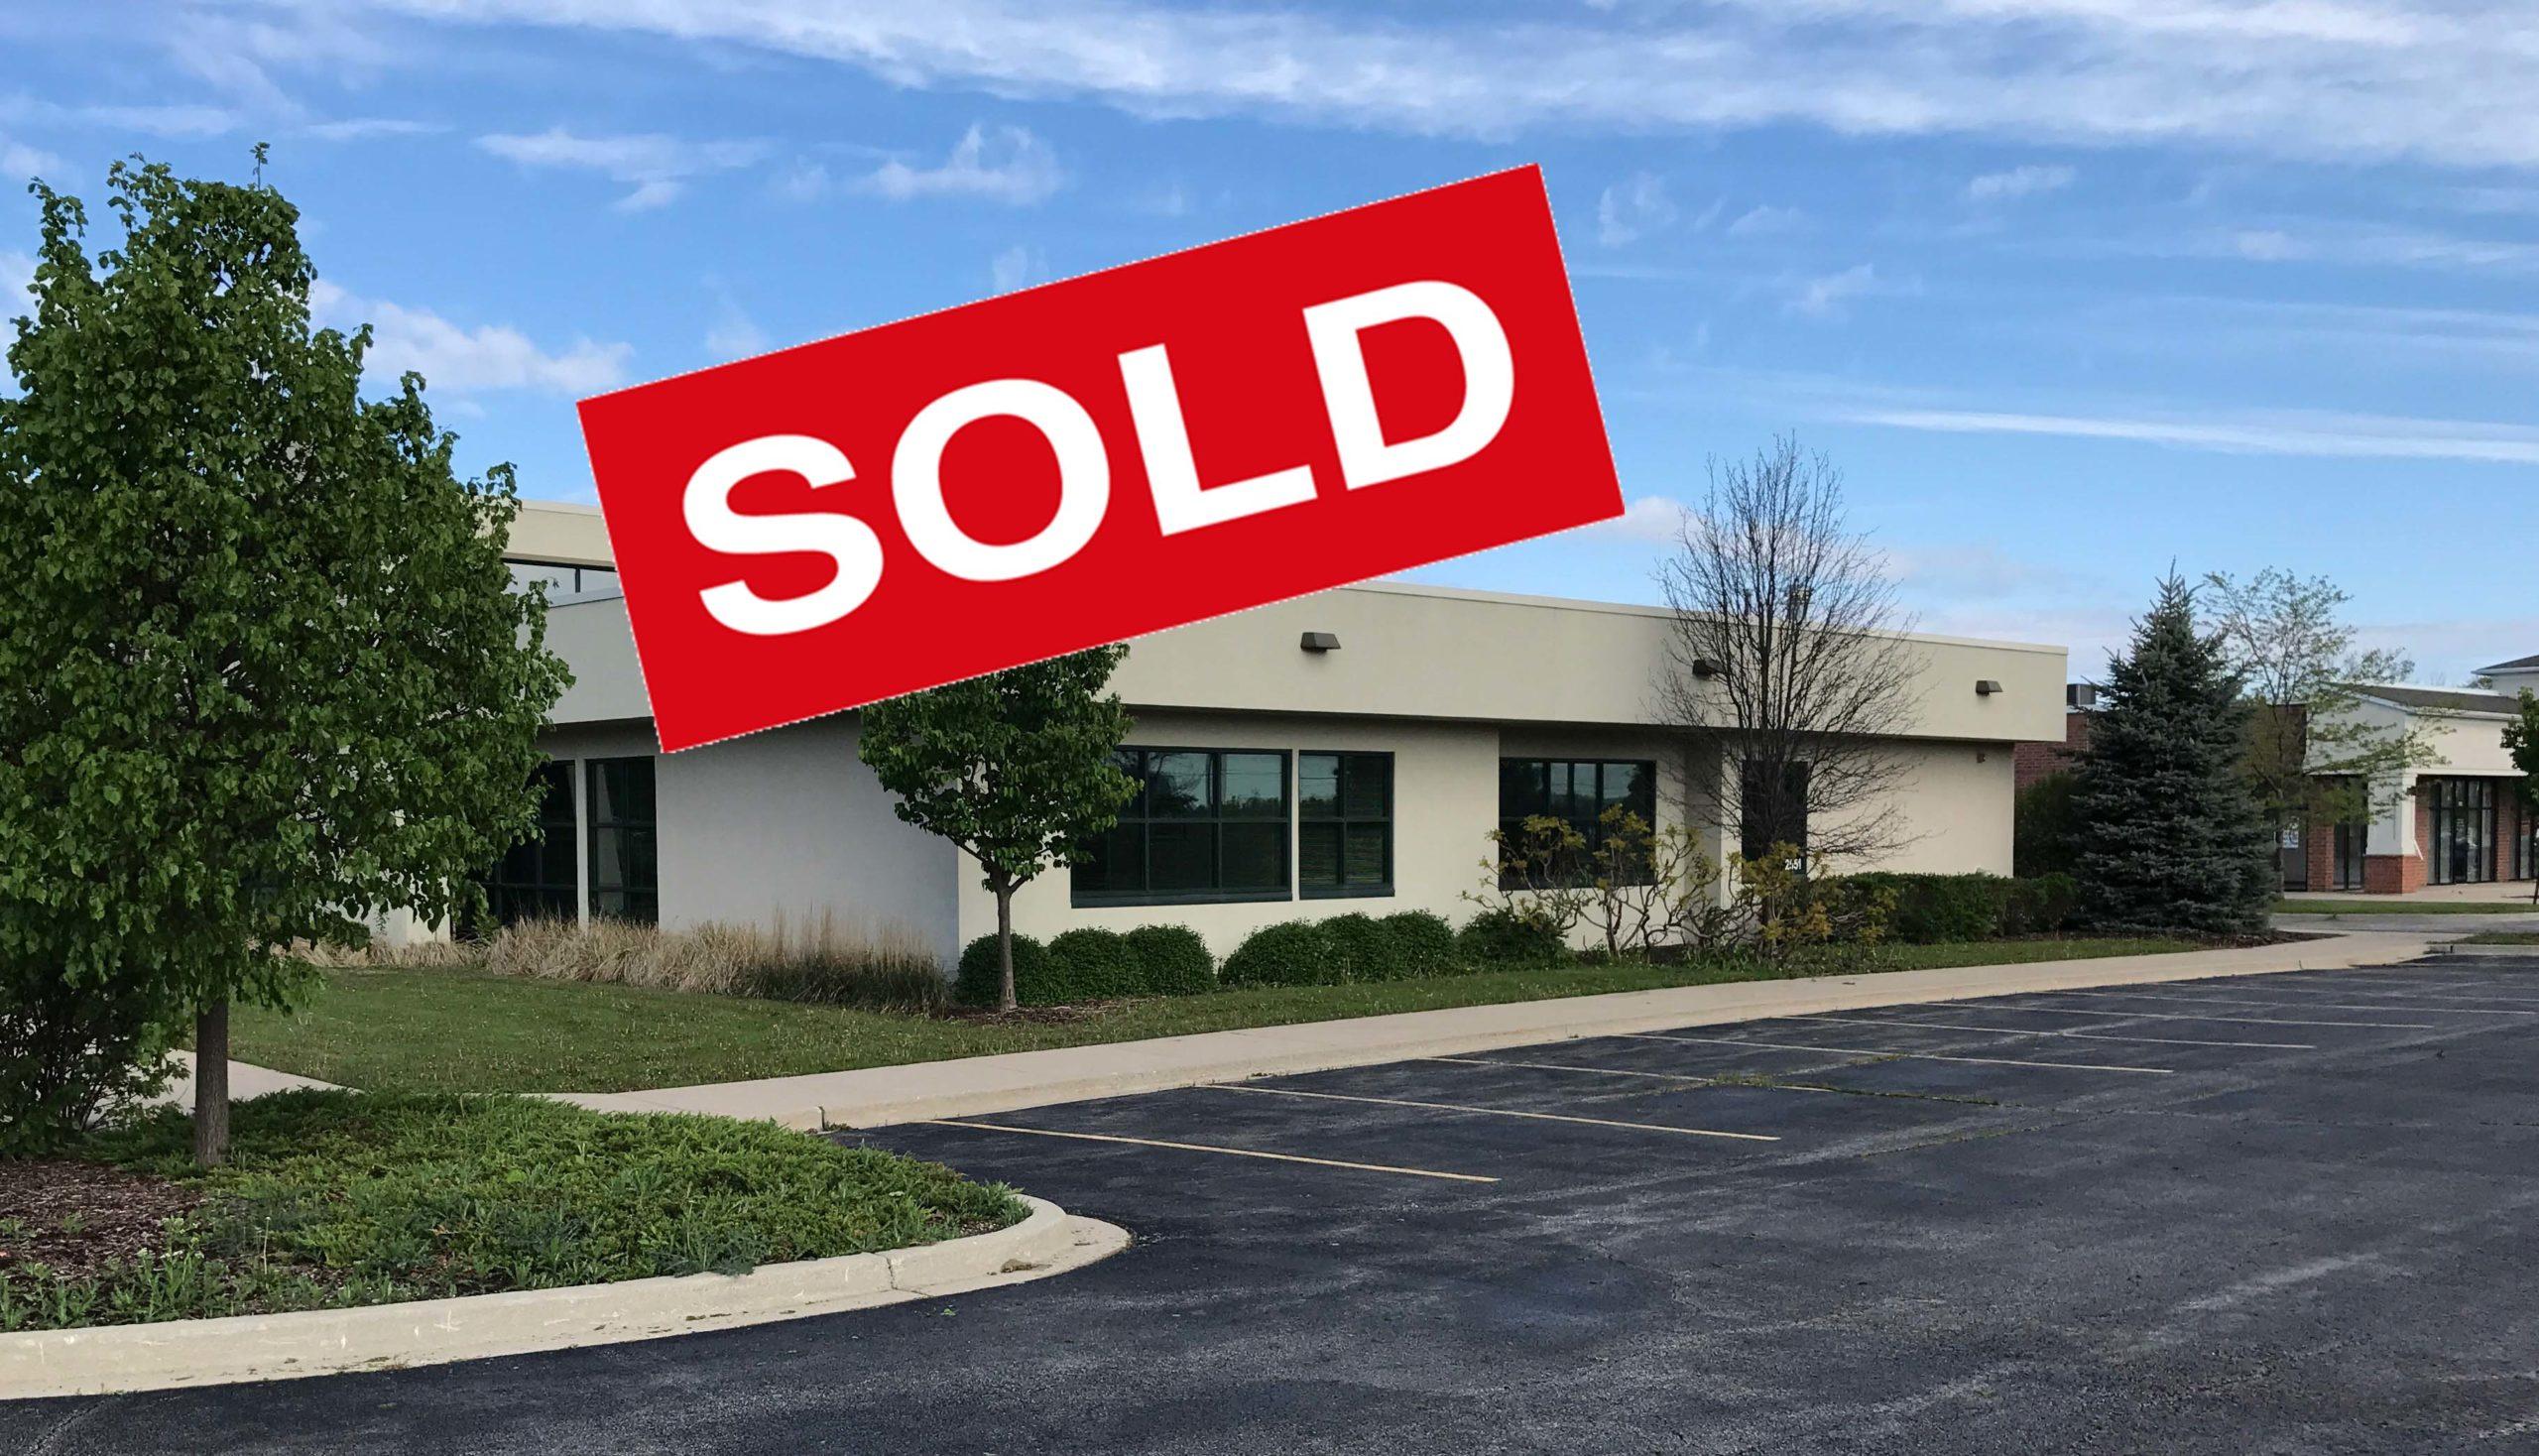 Sold-2551 N. Bridge Street | Yorkville, IL 60560